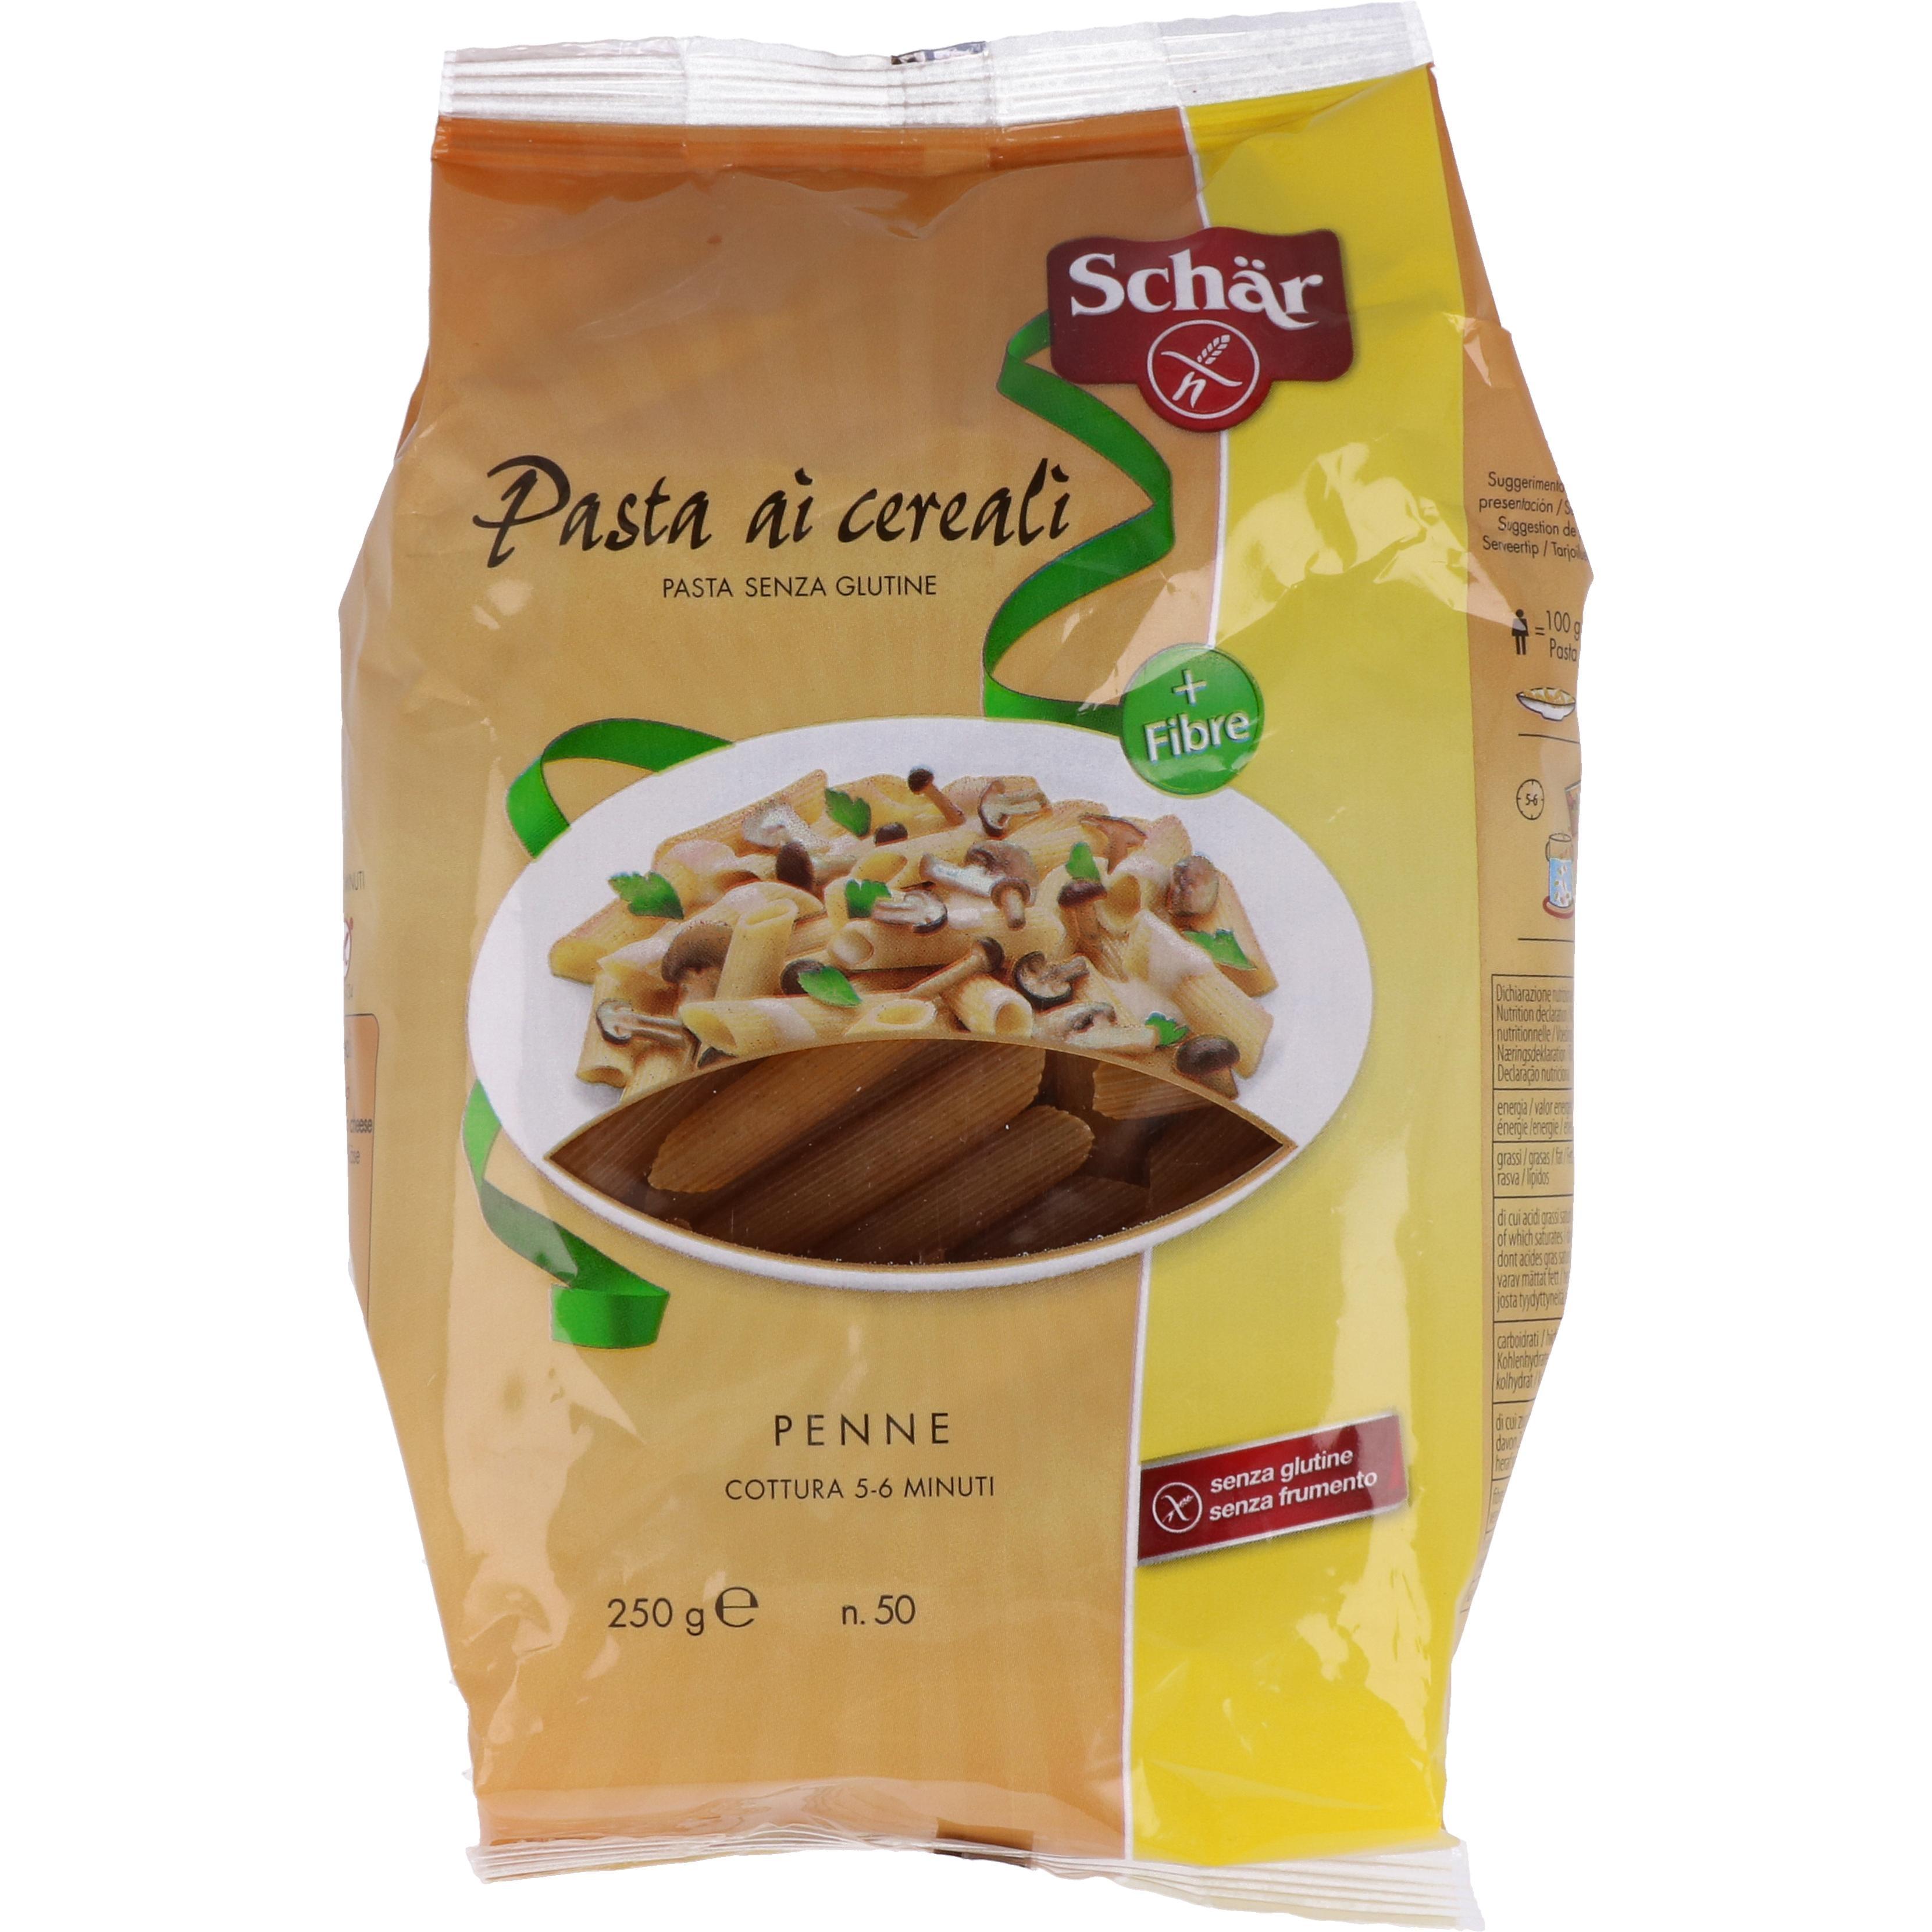 Schär Mehrkorn Penne - Pasta ai cereali 250g